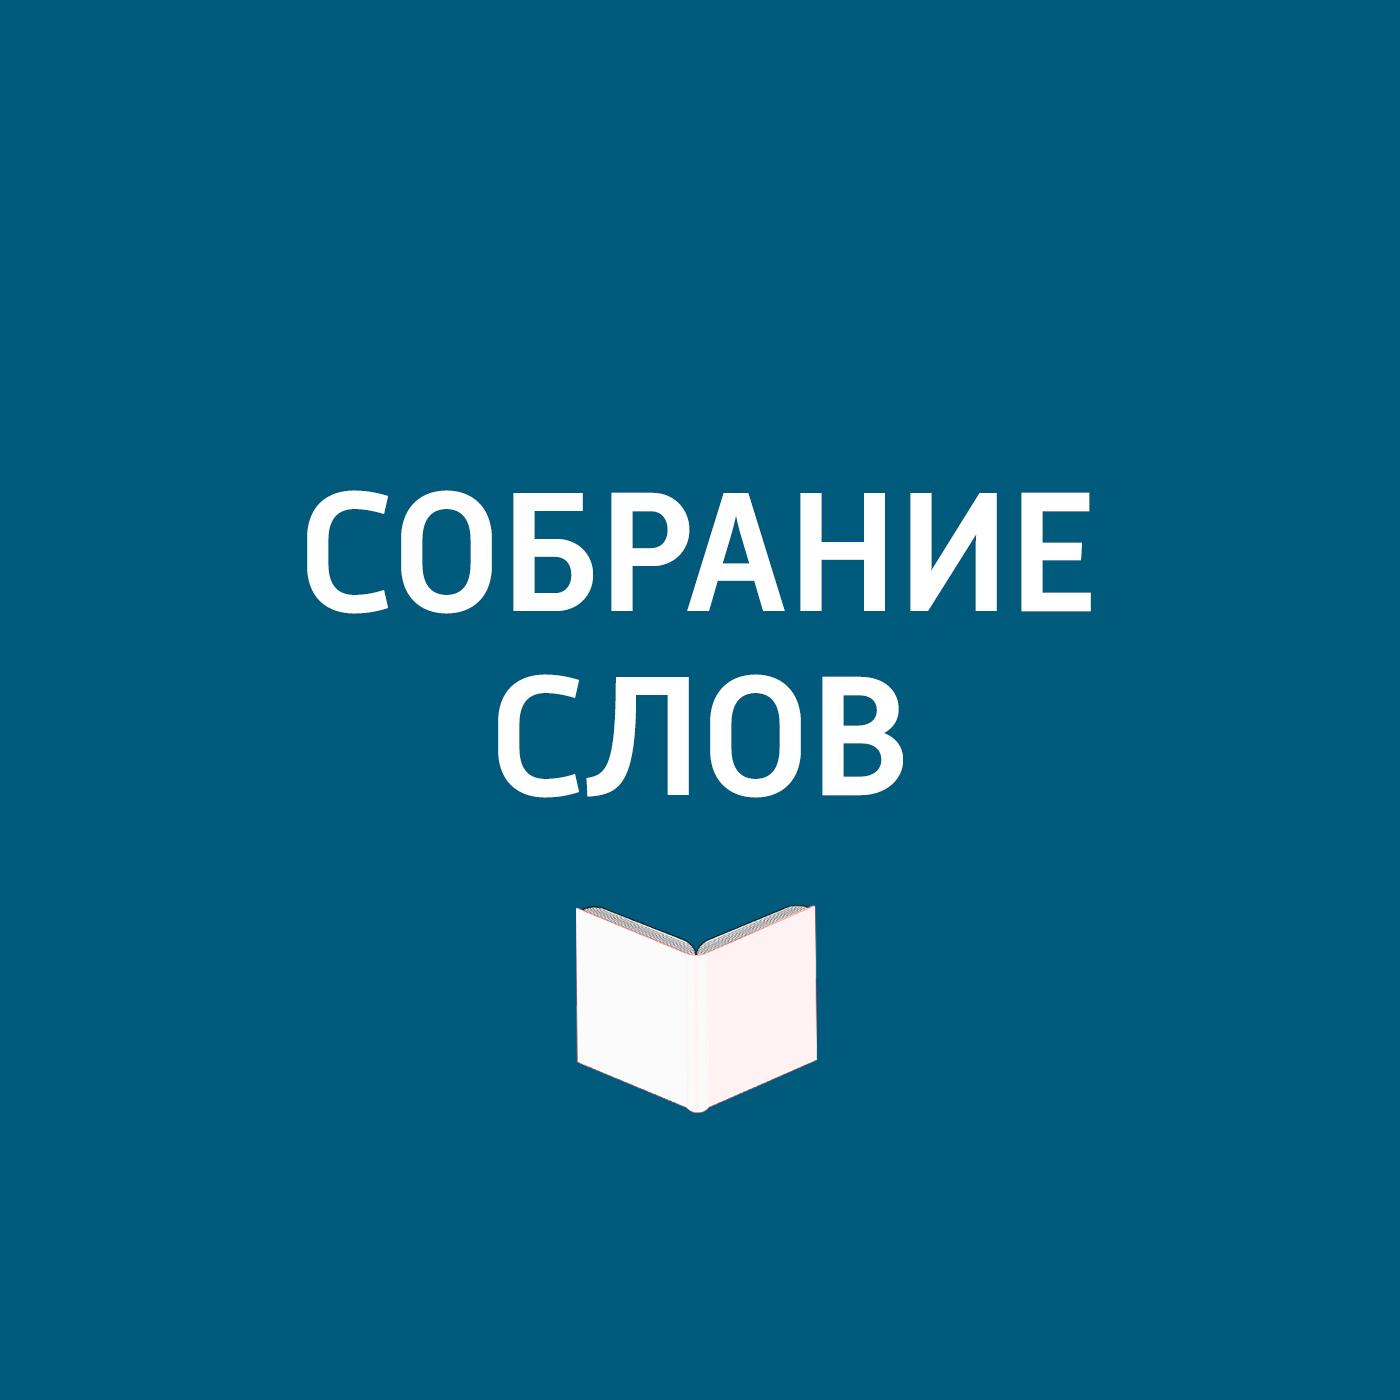 Творческий коллектив программы «Собрание слов» Ко дню памяти Мстислава Ростроповича цена